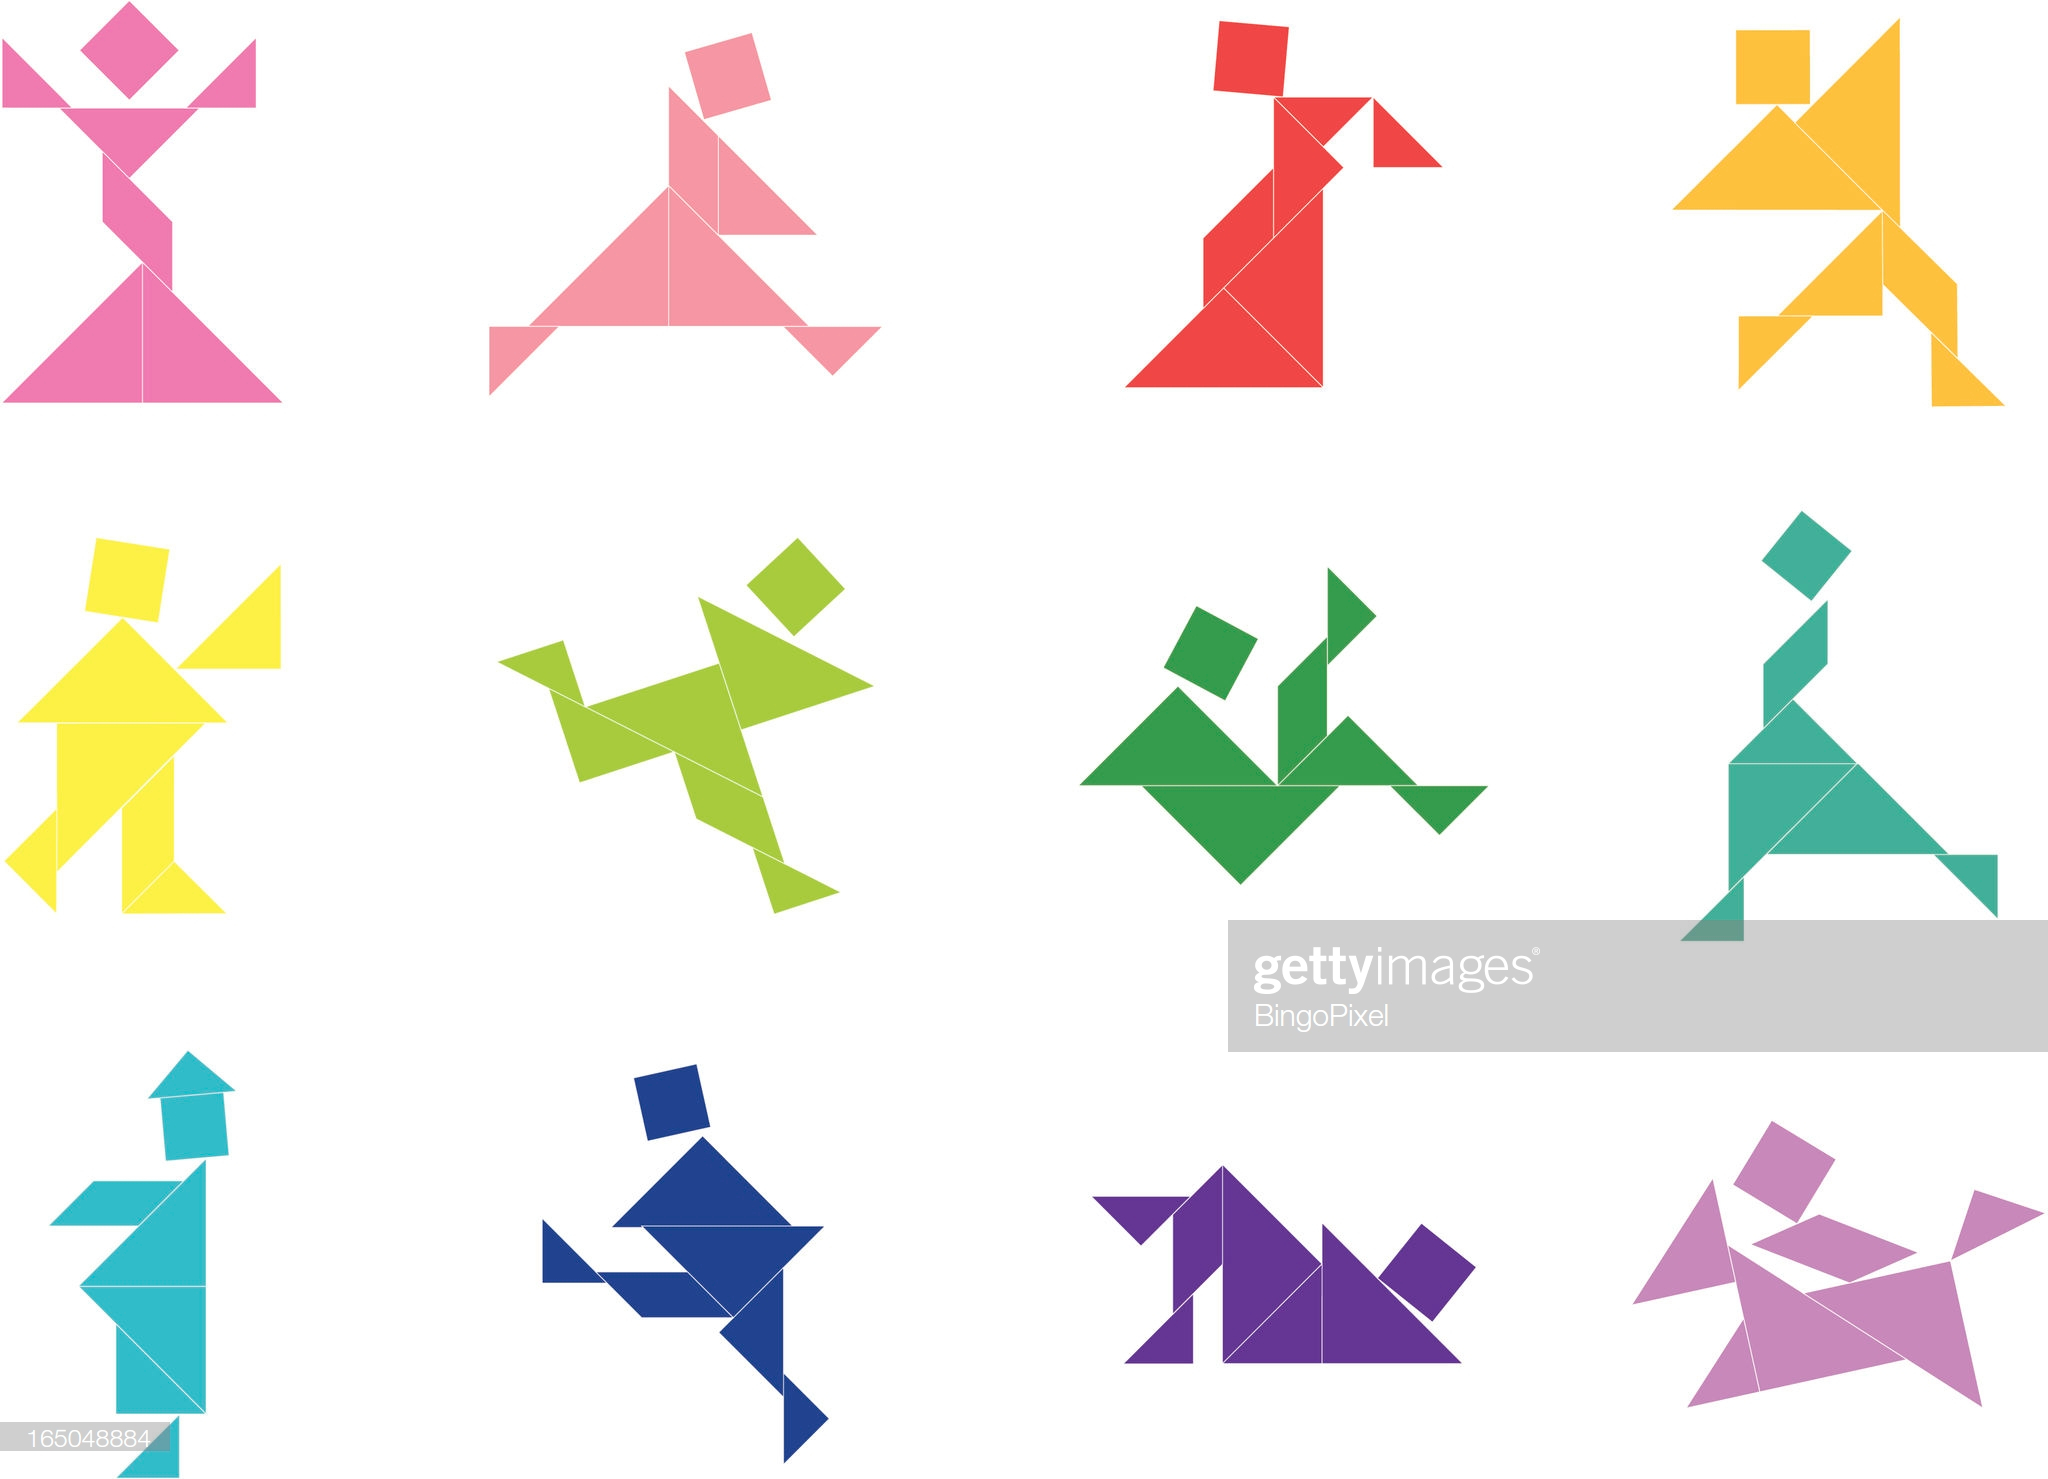 .yiyinglu/istockphoto/images/buttons/tangram_Set.gif concernant Tangram En Ligne